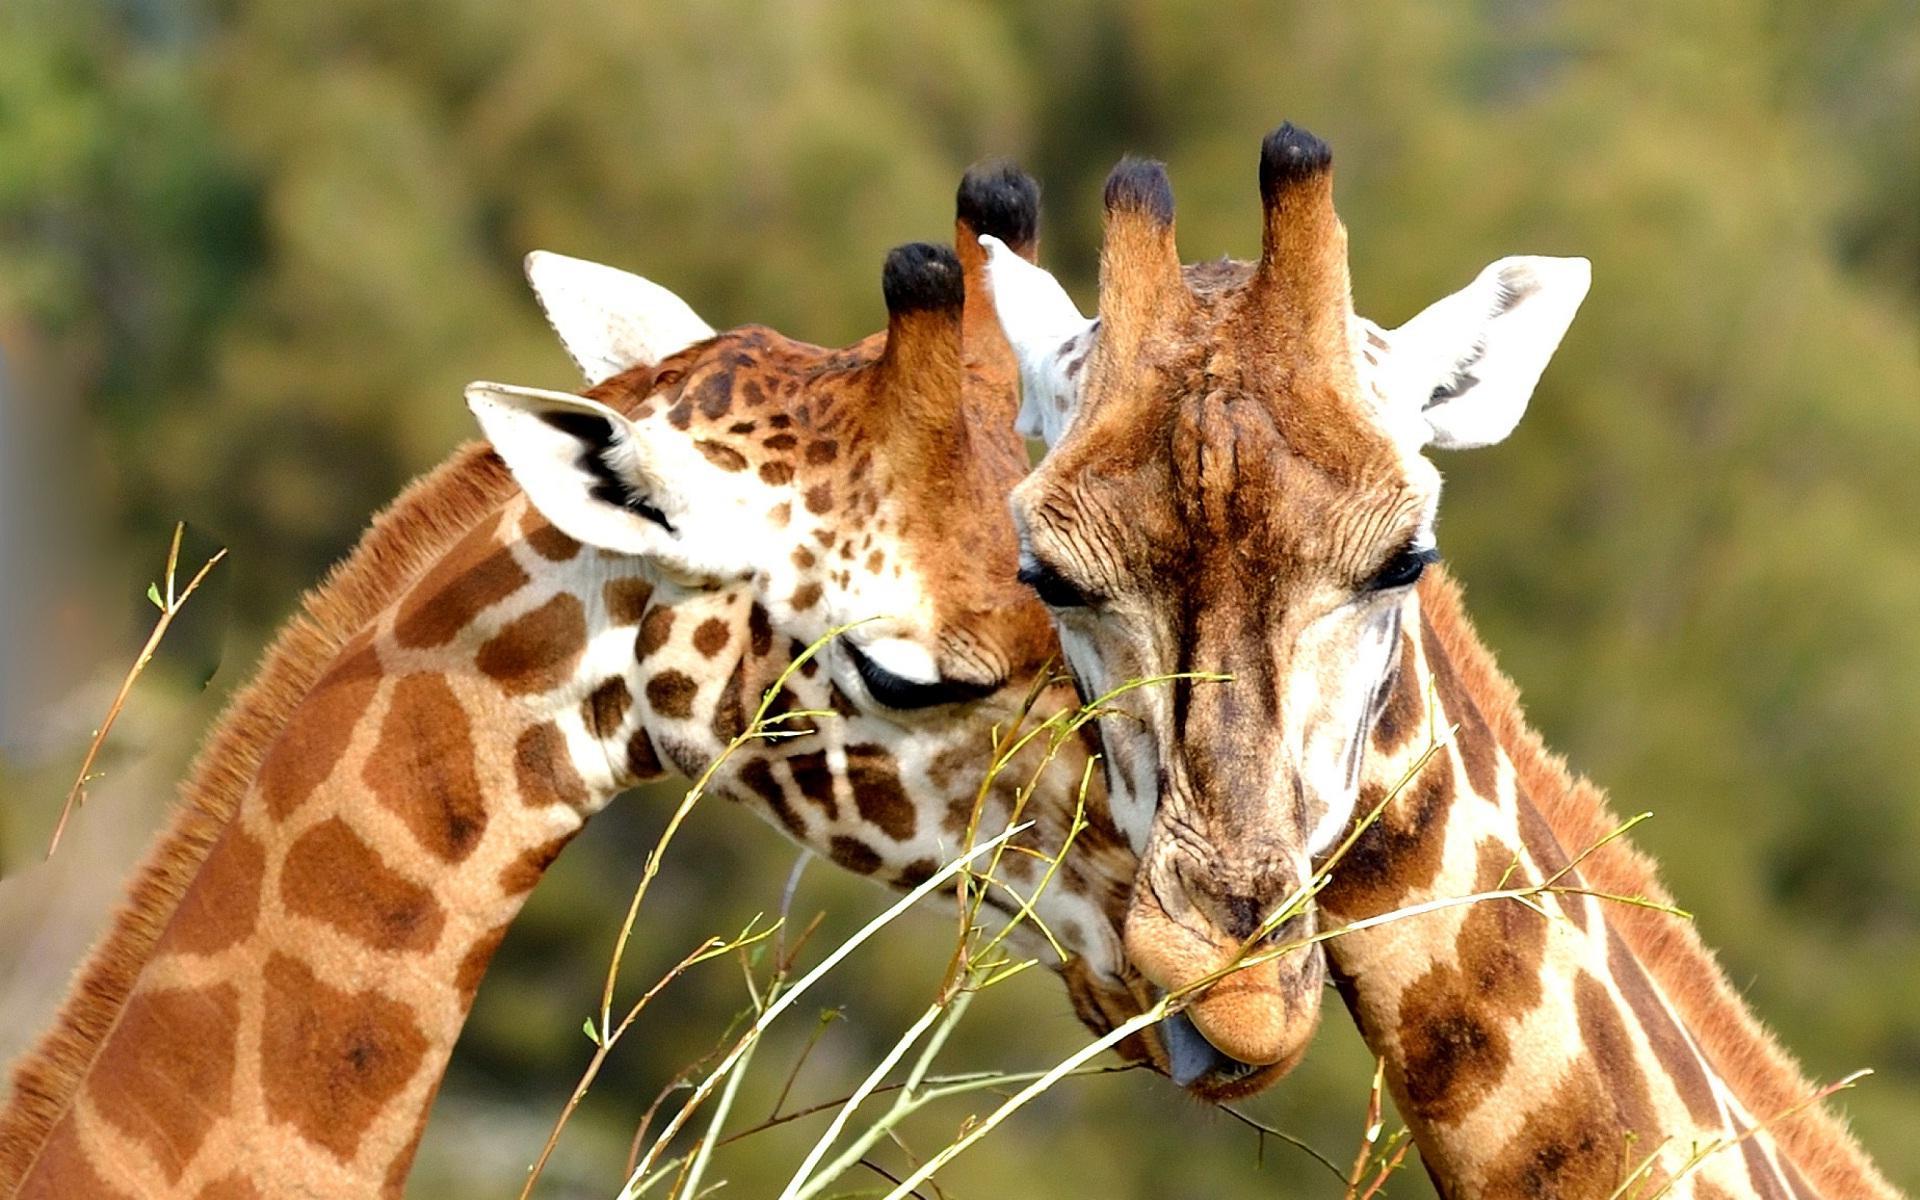 cute giraffe hd wallpaper 68685